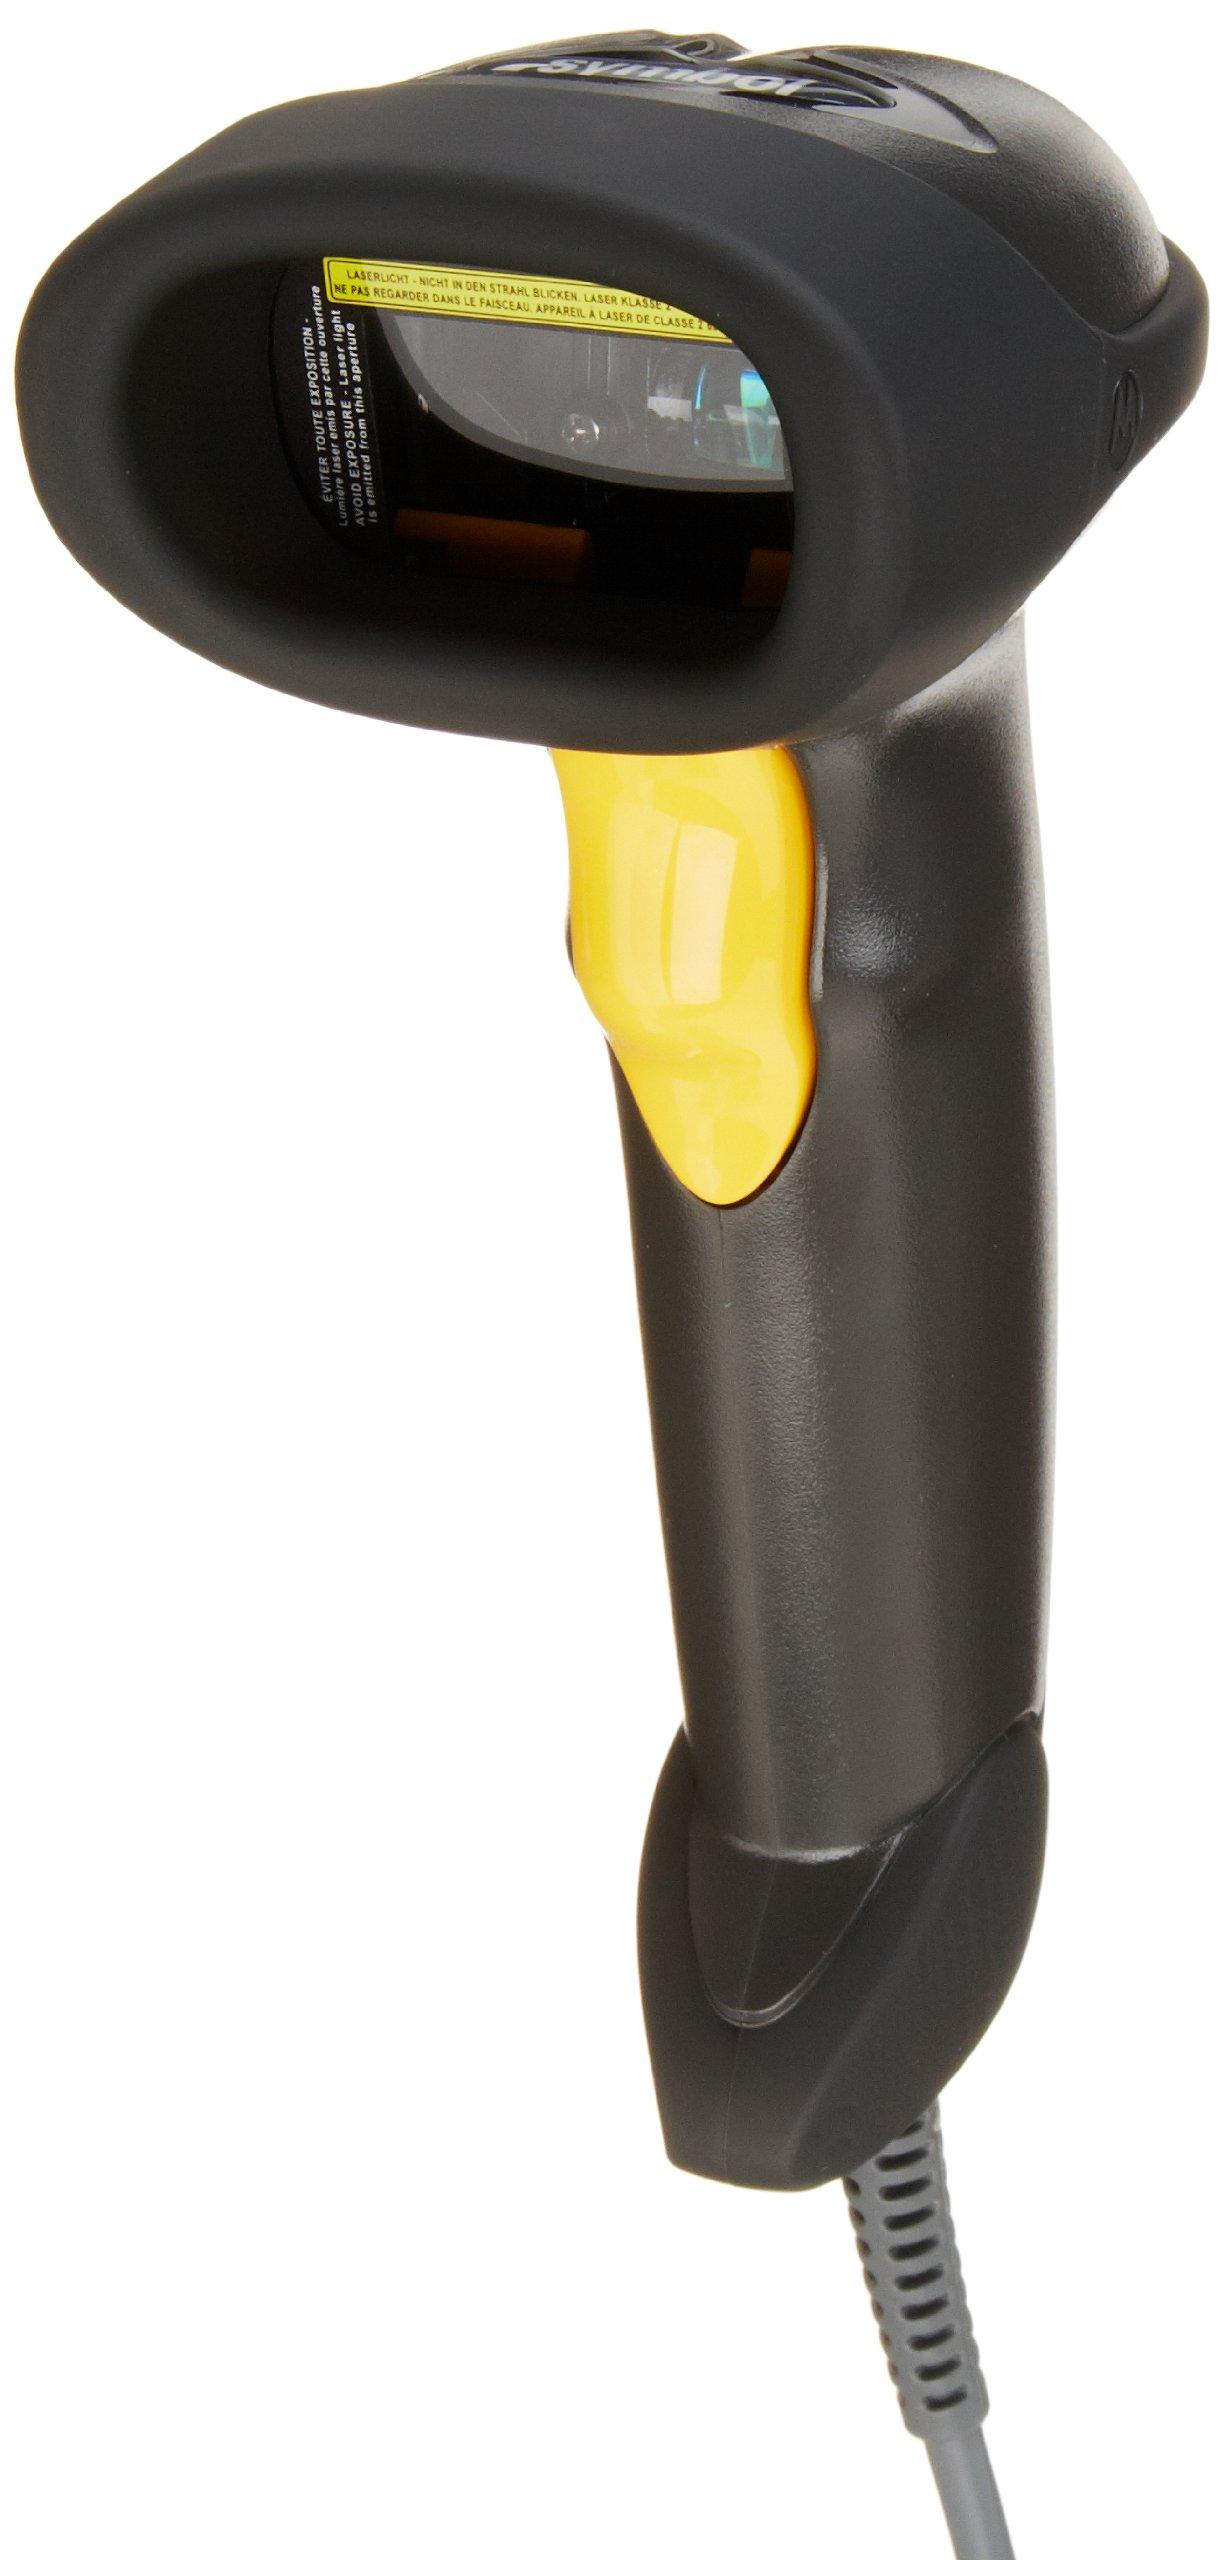 Symbol LS2208 General Purpose Handheld 1D Bi-Directional Laser Barcode Scanner, Black